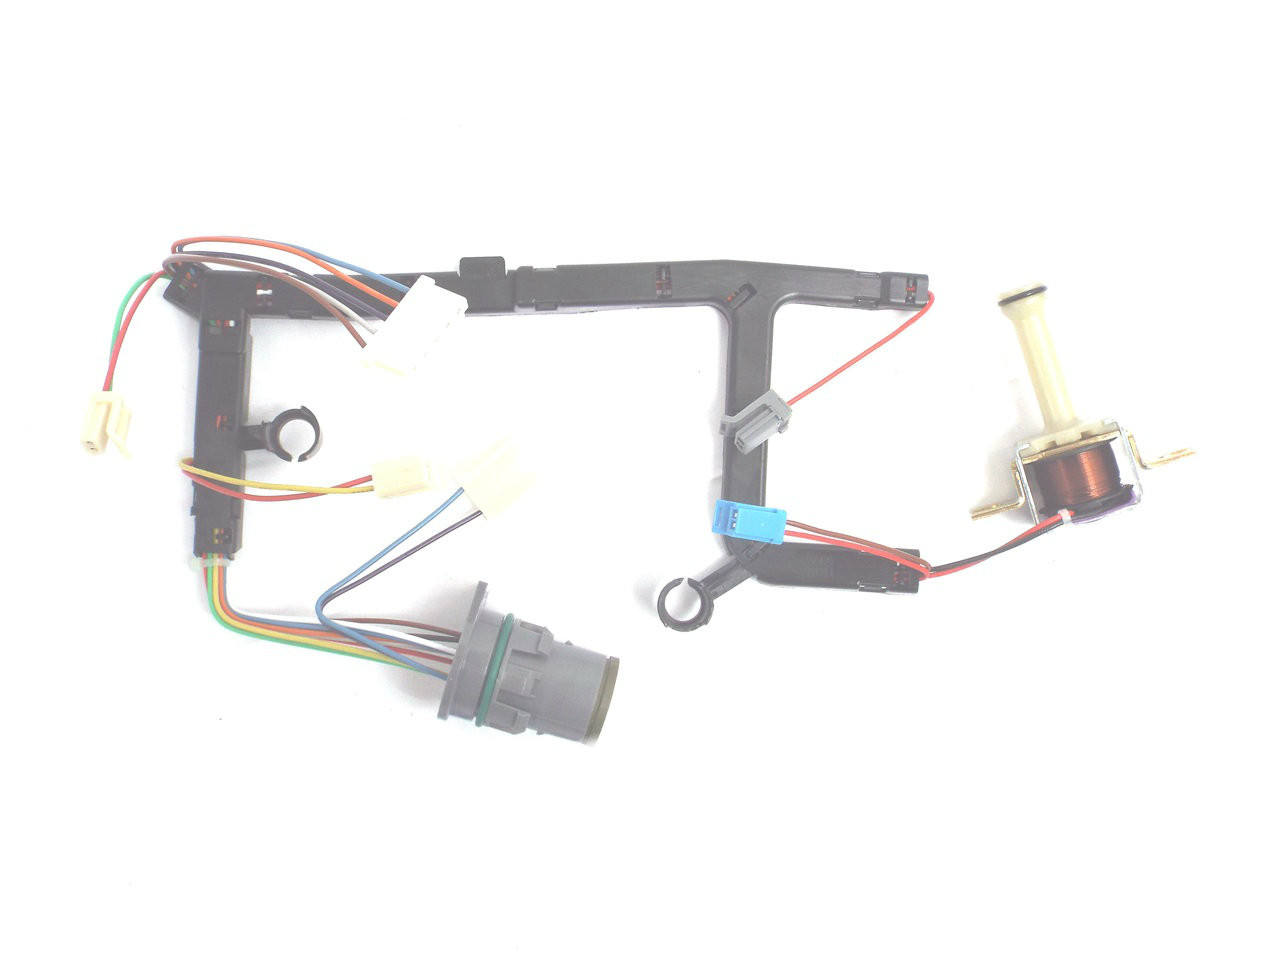 03 honda odyssey tcc wiring diagram 4l60e tcc lockup solenoid   wire harness  1997 2002  new fast  4l60e tcc lockup solenoid   wire